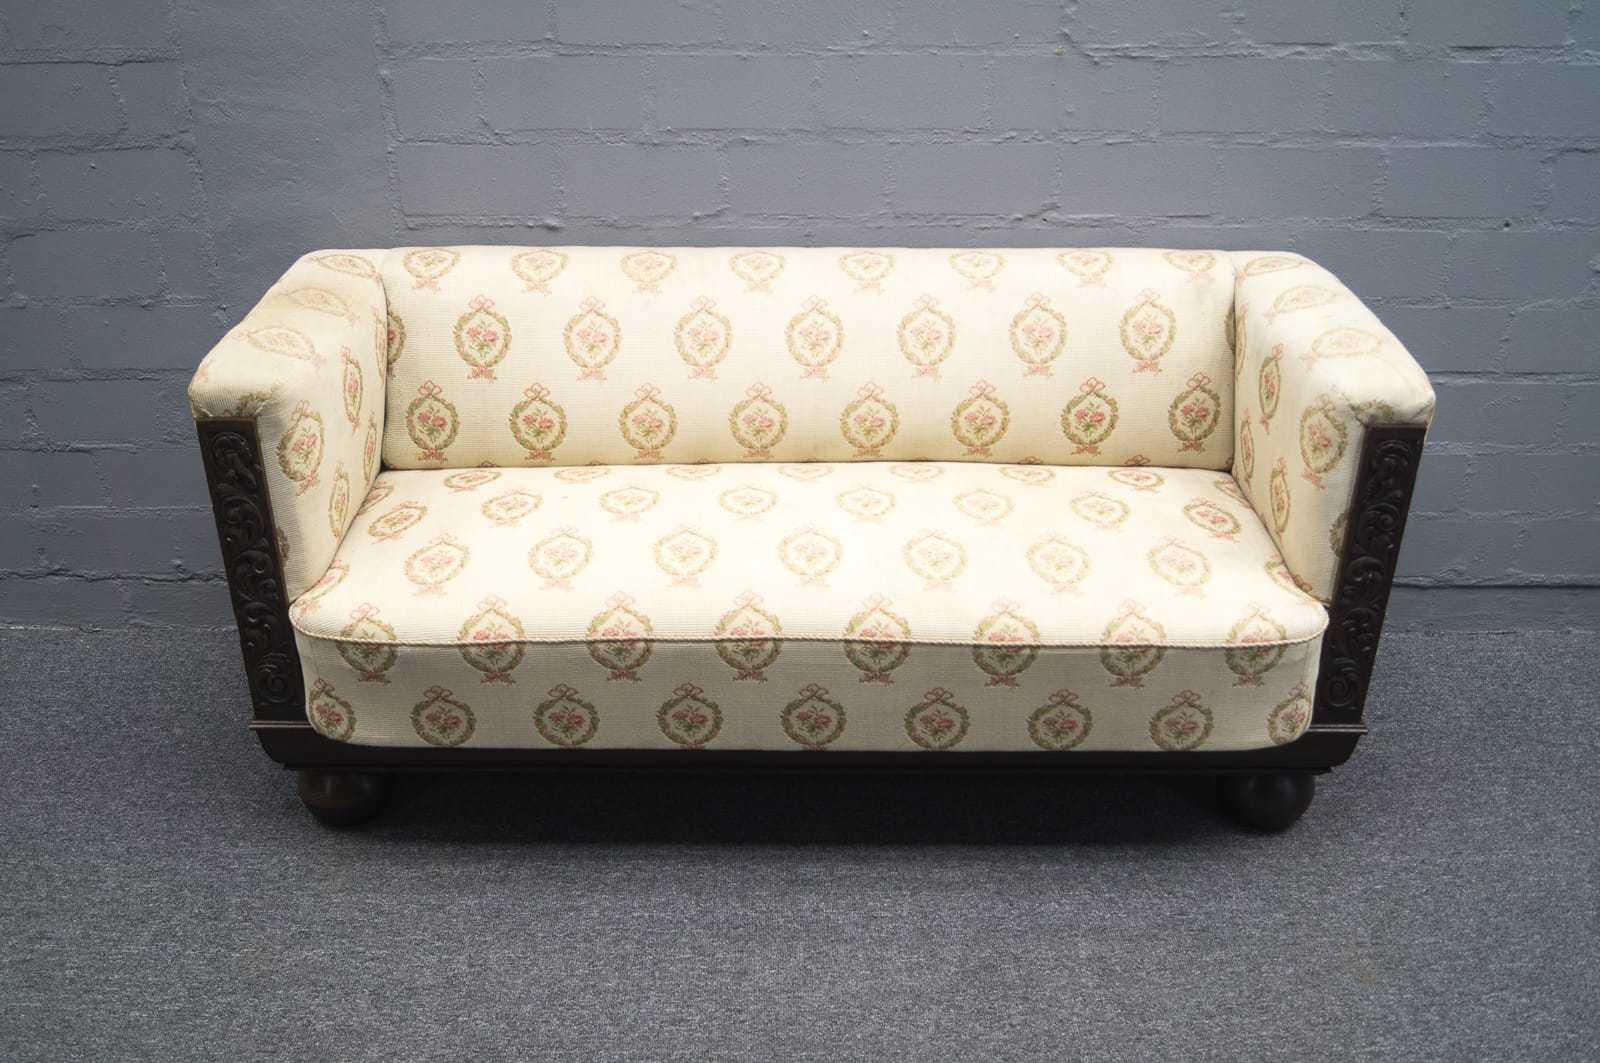 art deco sofagarnitur sofa sessel kubisch bauhaus kubus 20er 30er ebay. Black Bedroom Furniture Sets. Home Design Ideas